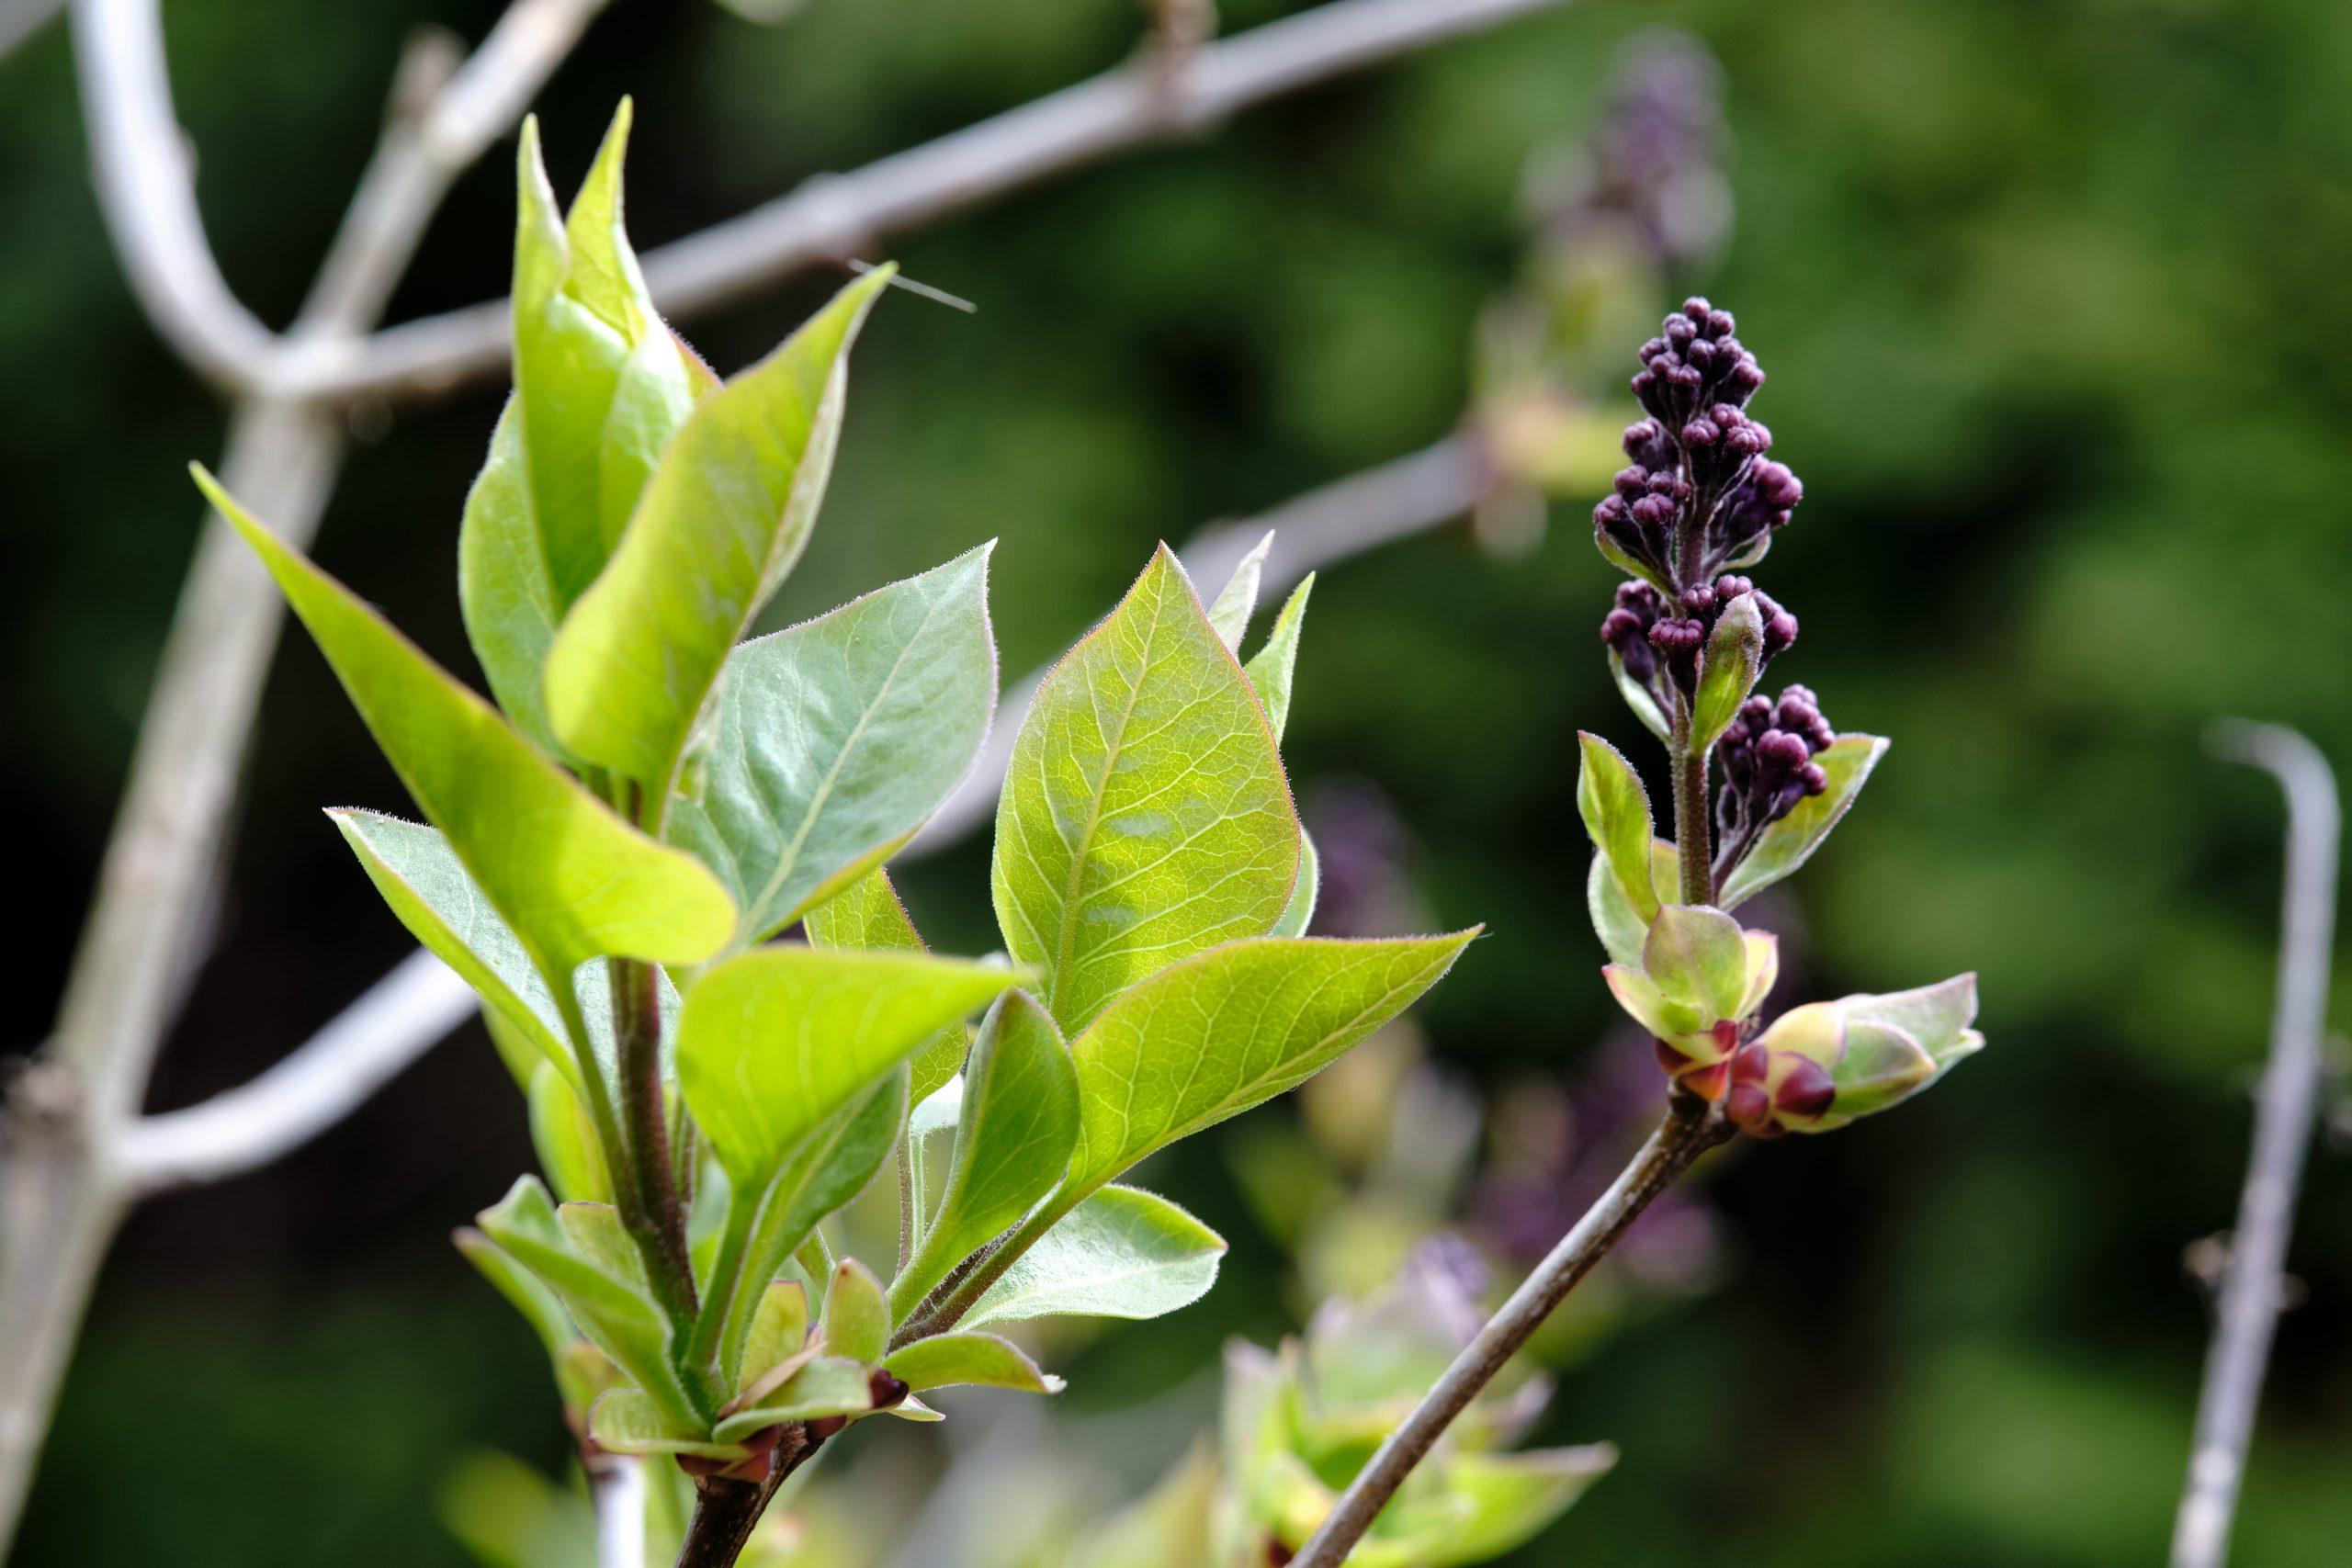 Lilac in Bloom 8 April 2021 Oregon Copyright Steve J Davis